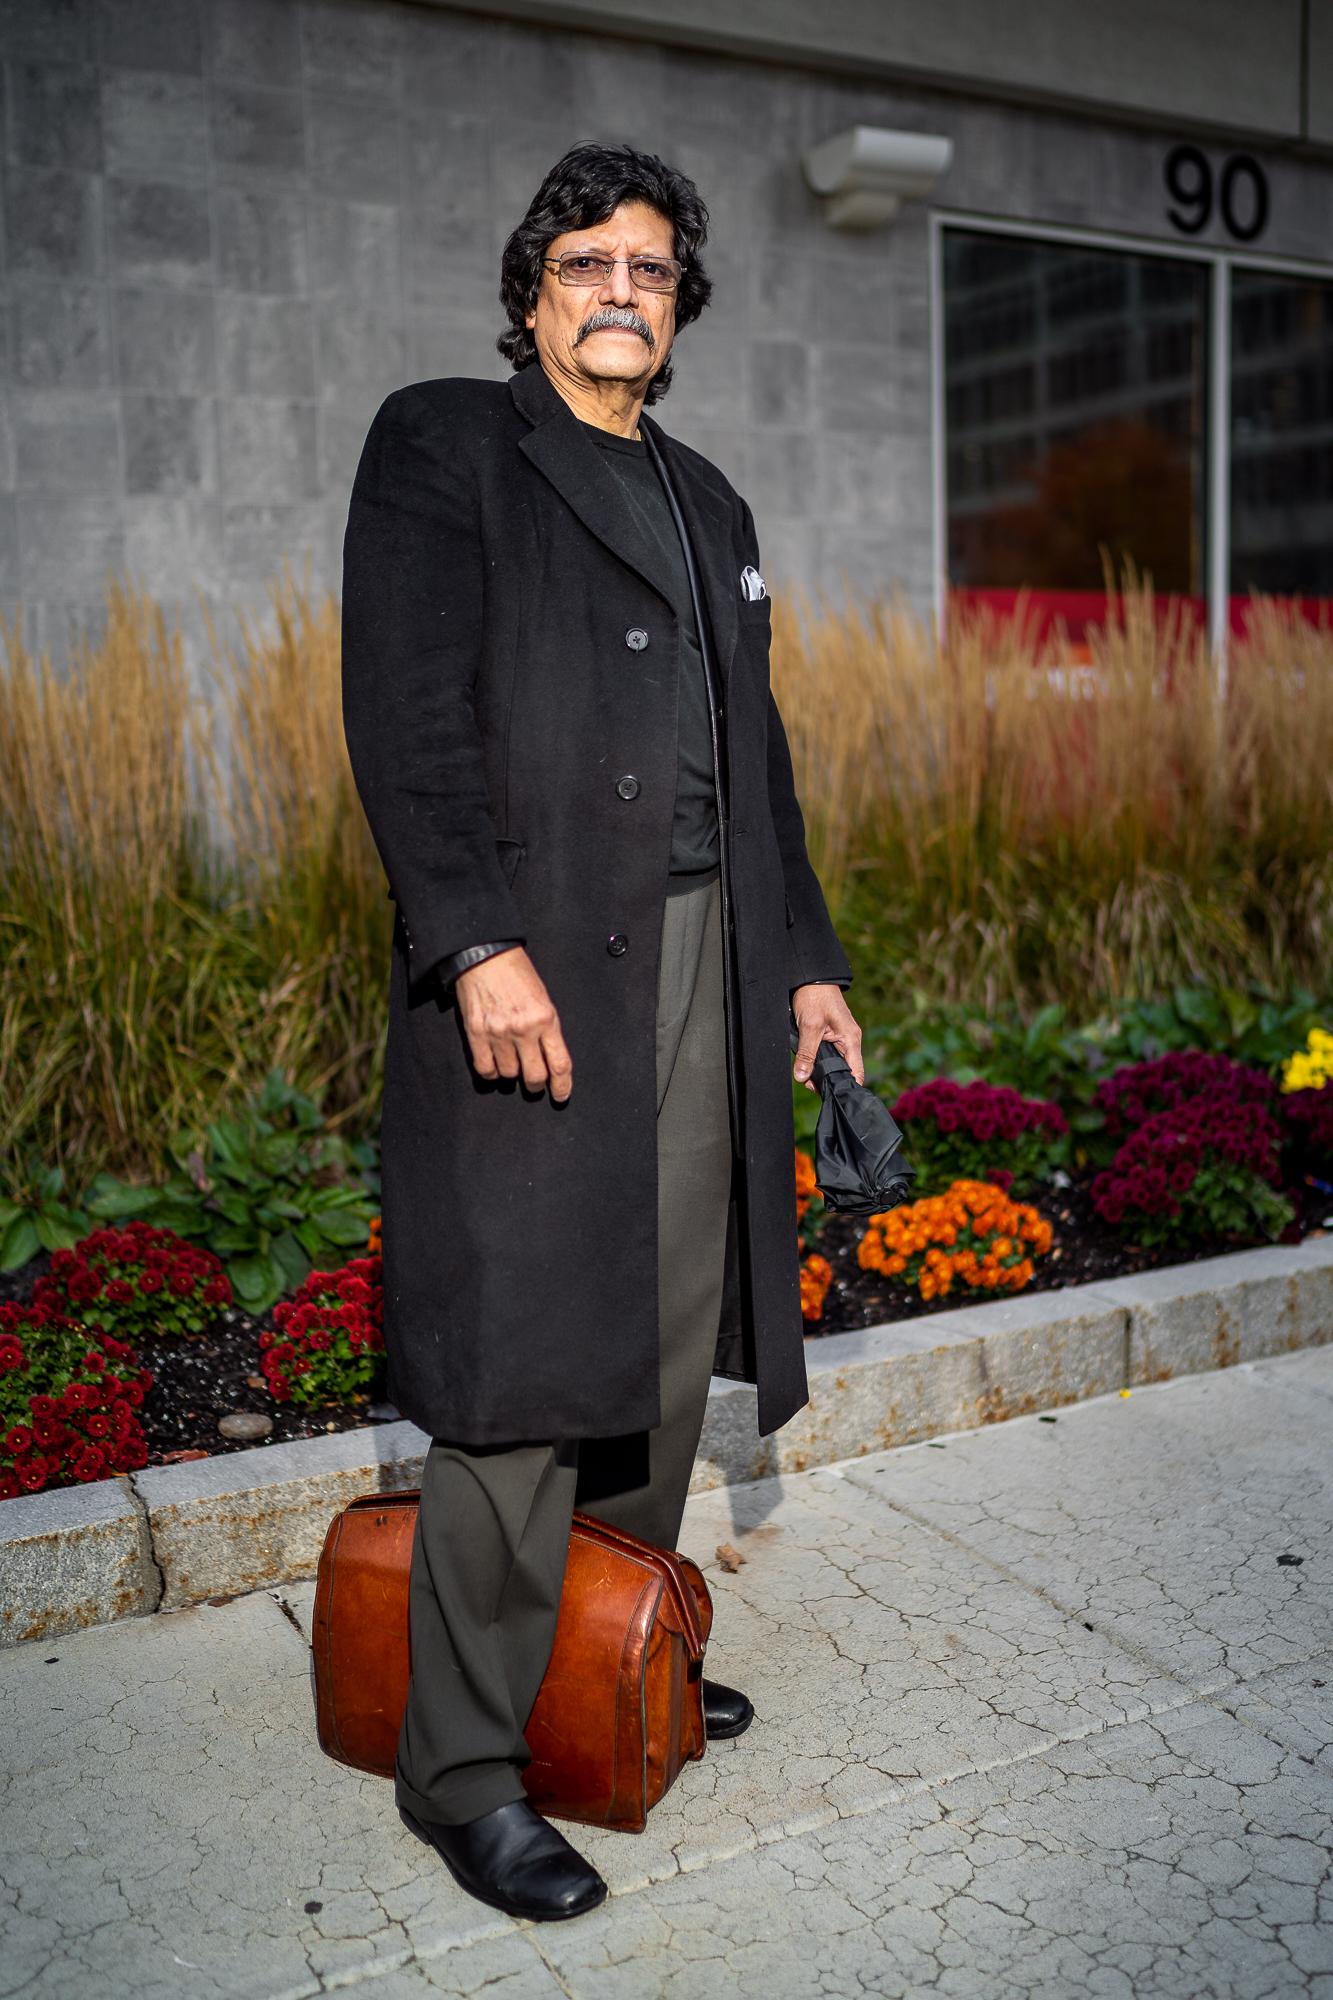 Dorian, Clinical Psychologist, Front Street, October, 2018.